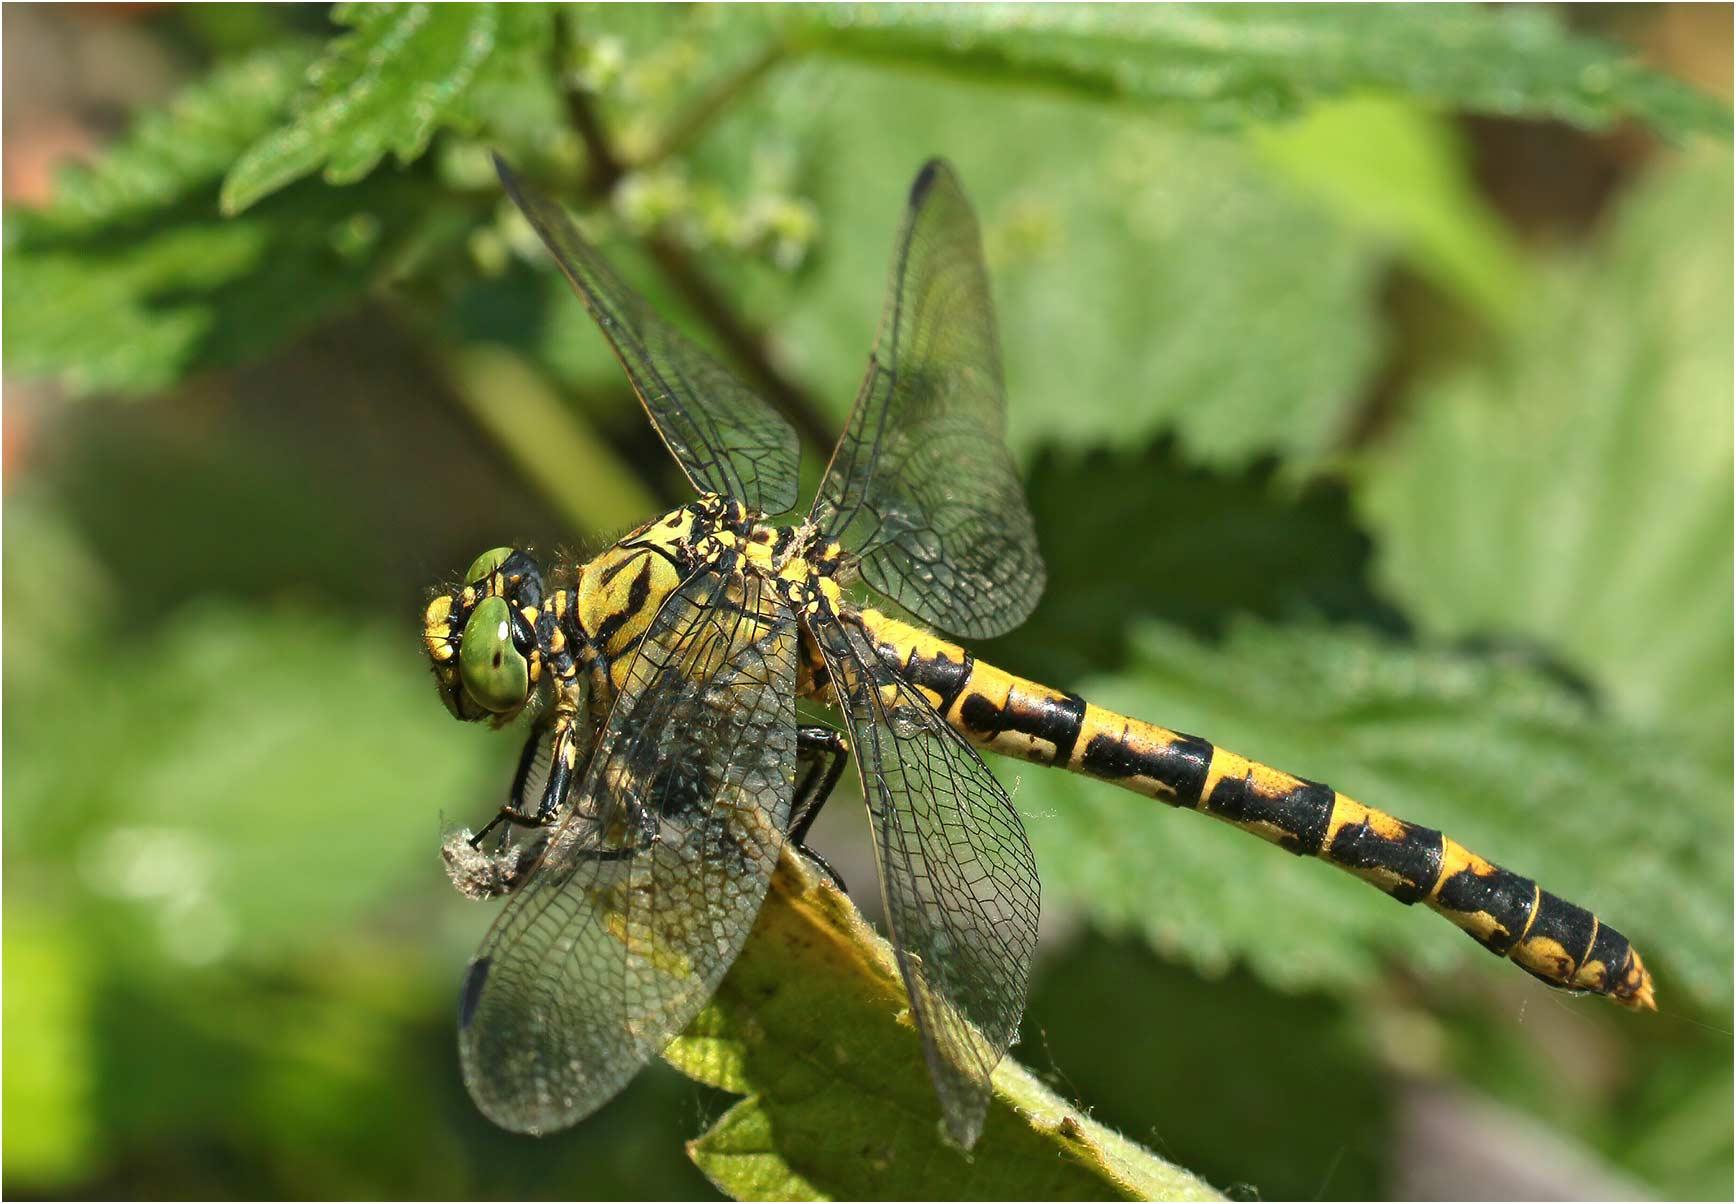 Onychogomphus forcipatus femelle, Portet sur Garonne (France-31), 19/07/2019